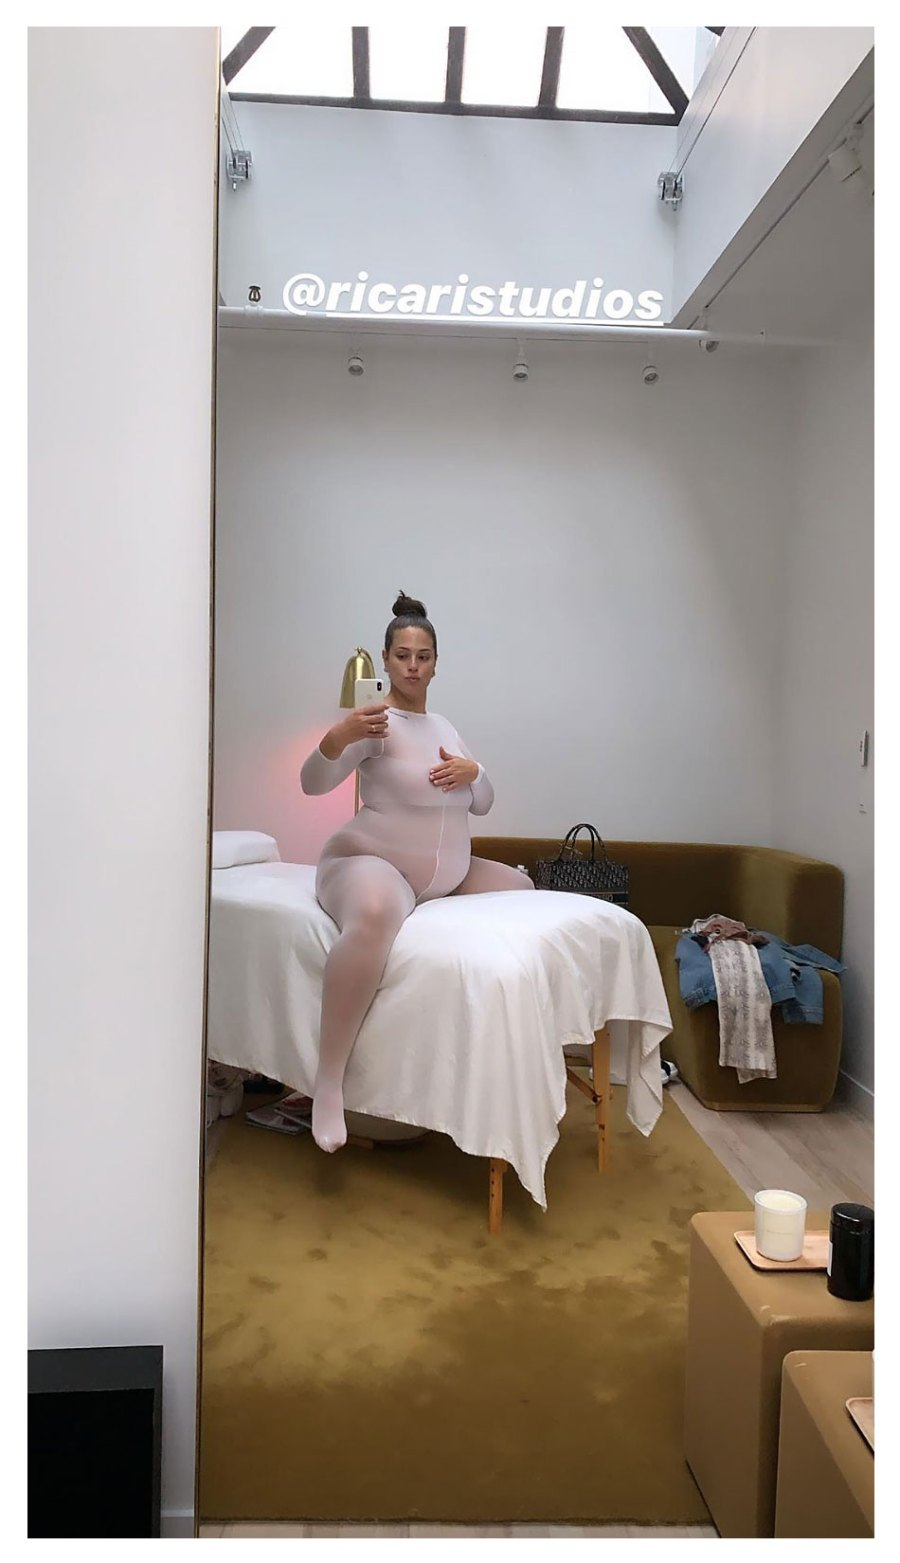 Ashley-Graham-Instagram-Selfie-Pregnancy-Sheer-White-Outfit